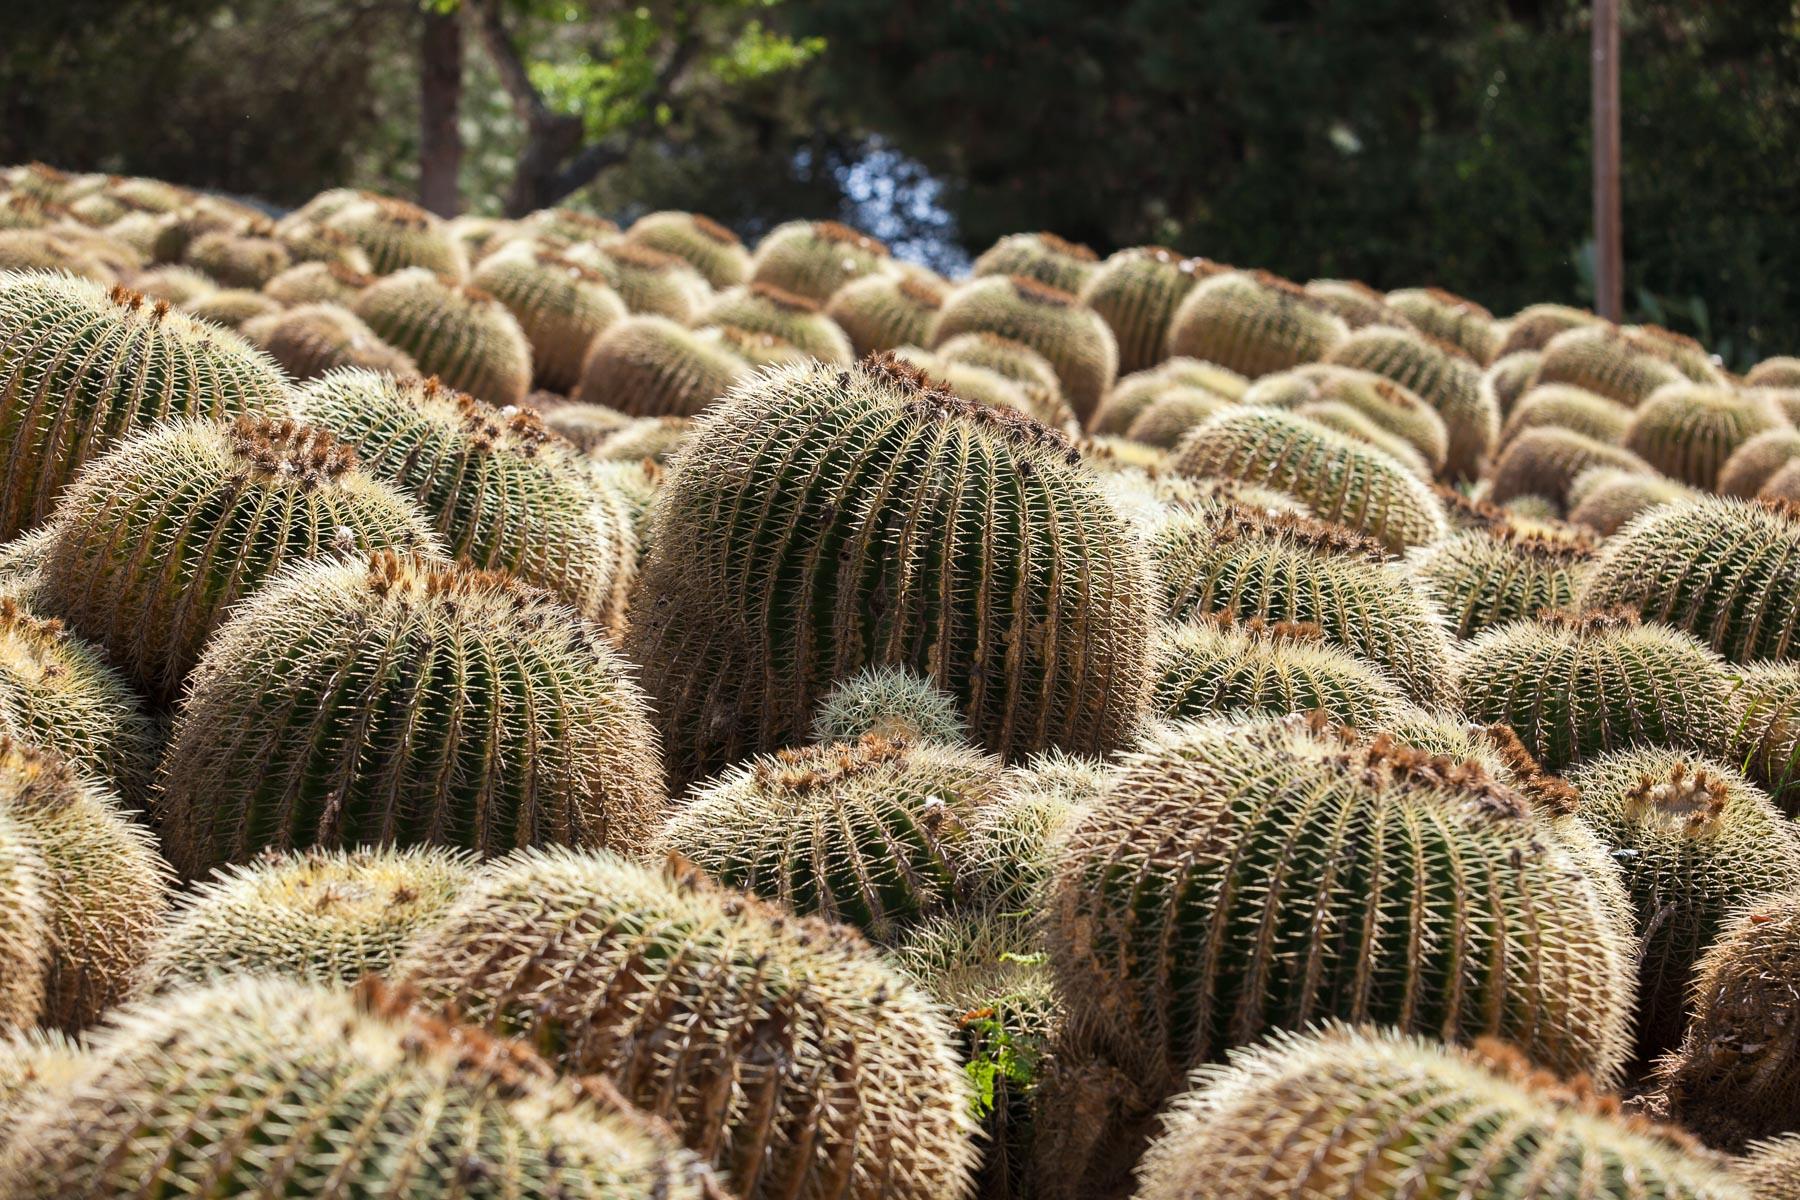 Pinya de Rosa botanic gardens, Costa Brava